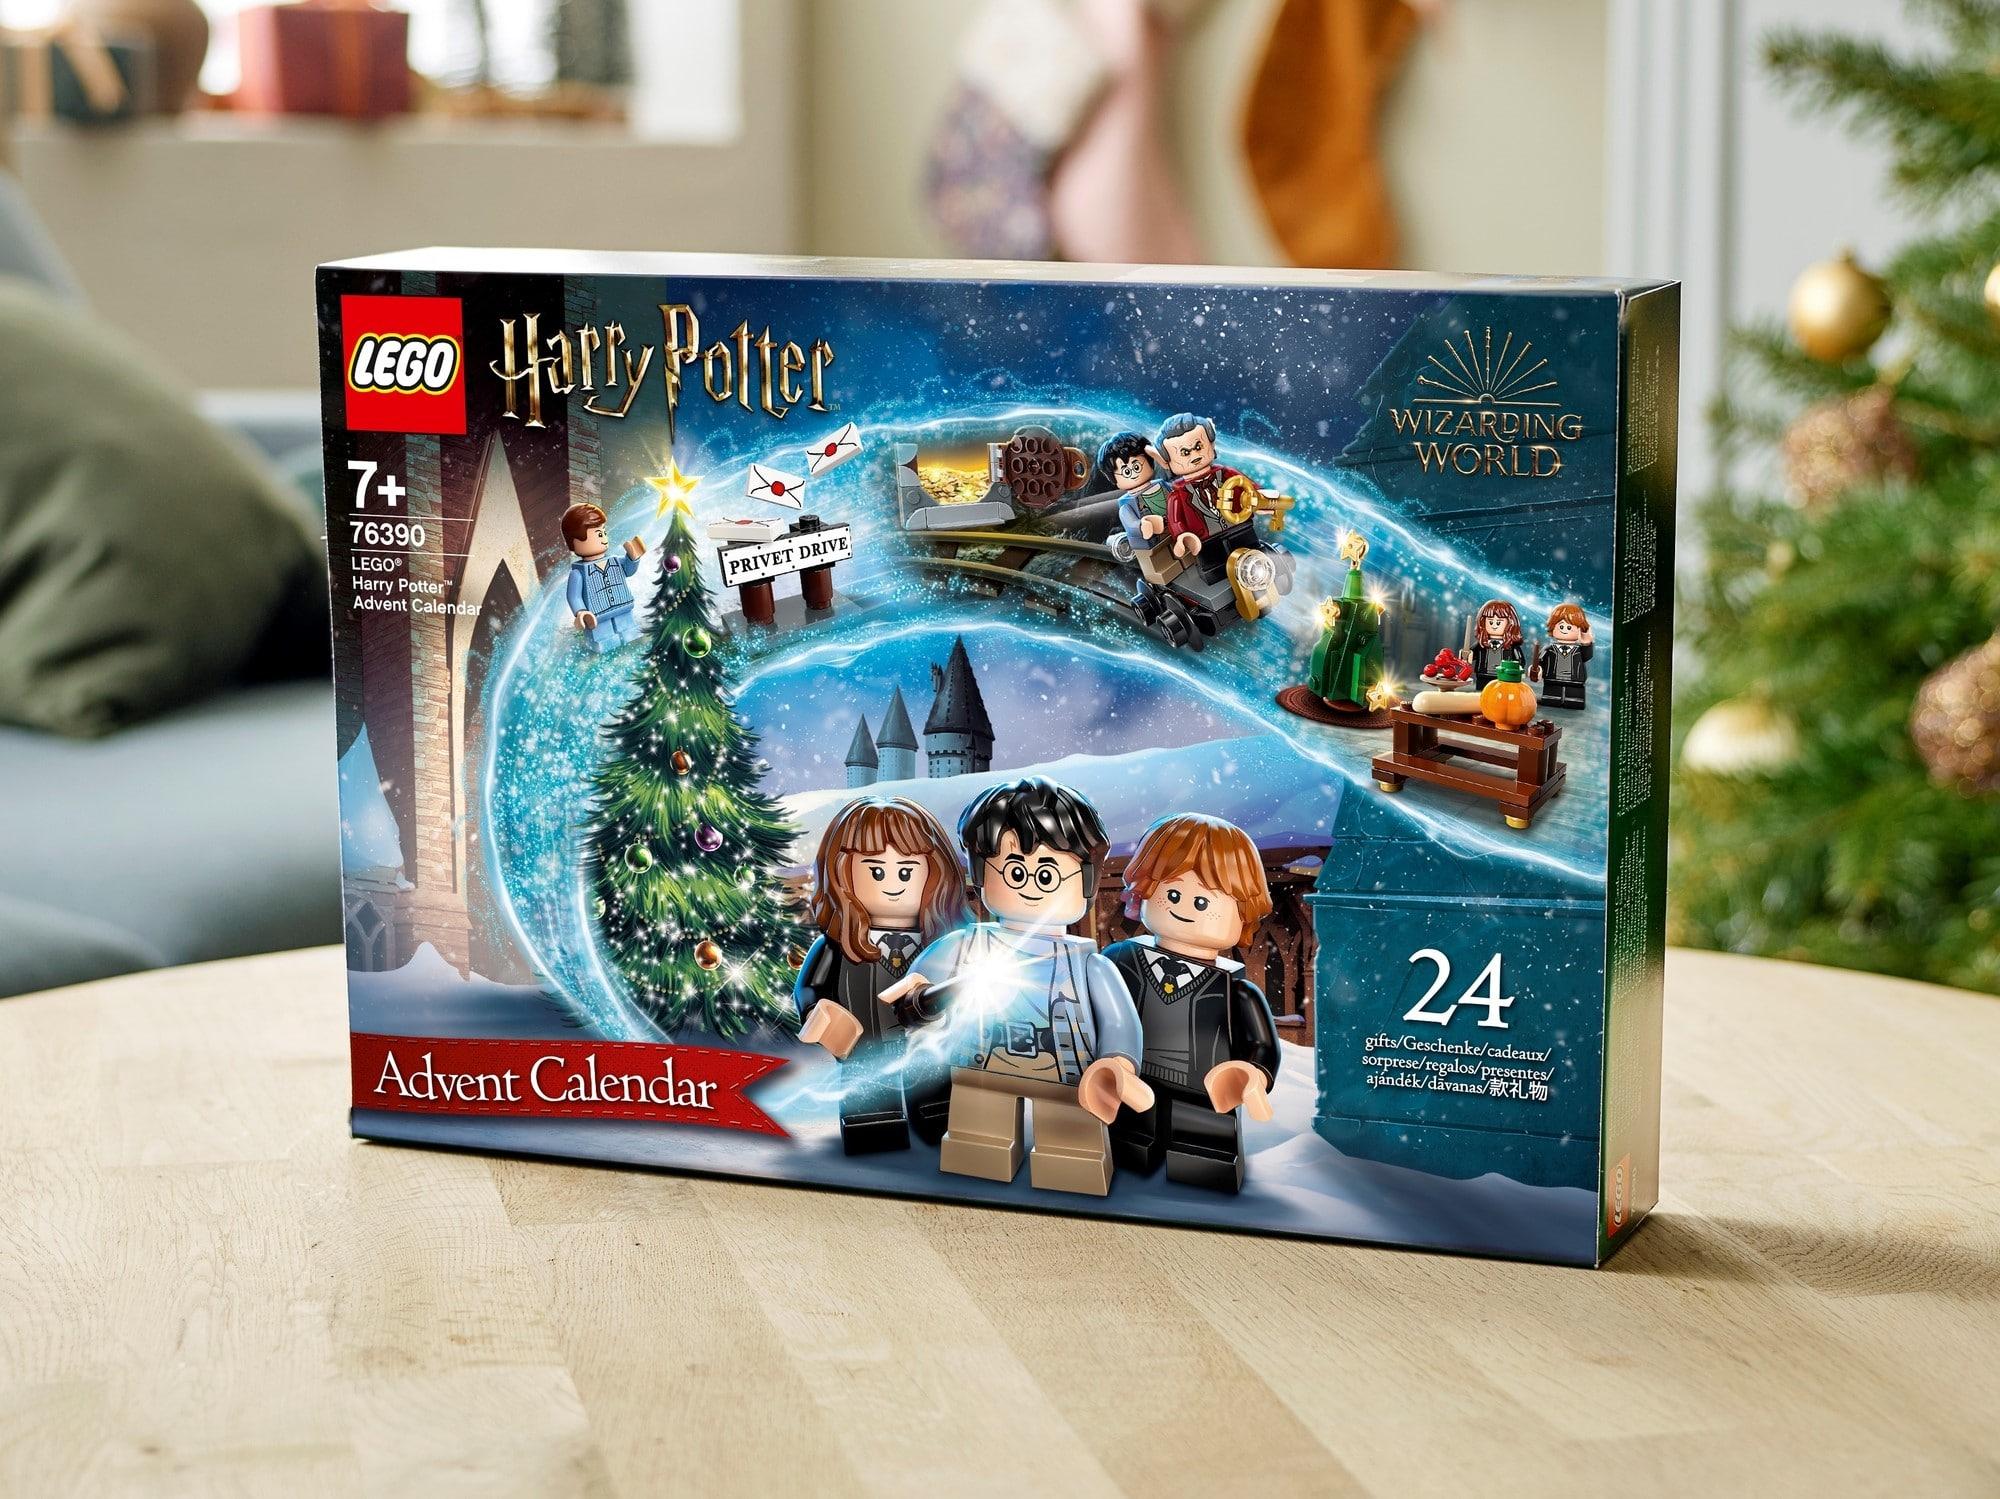 LEGO Harry Potter 76390 LEGO Harry Potter Adventskalender 7